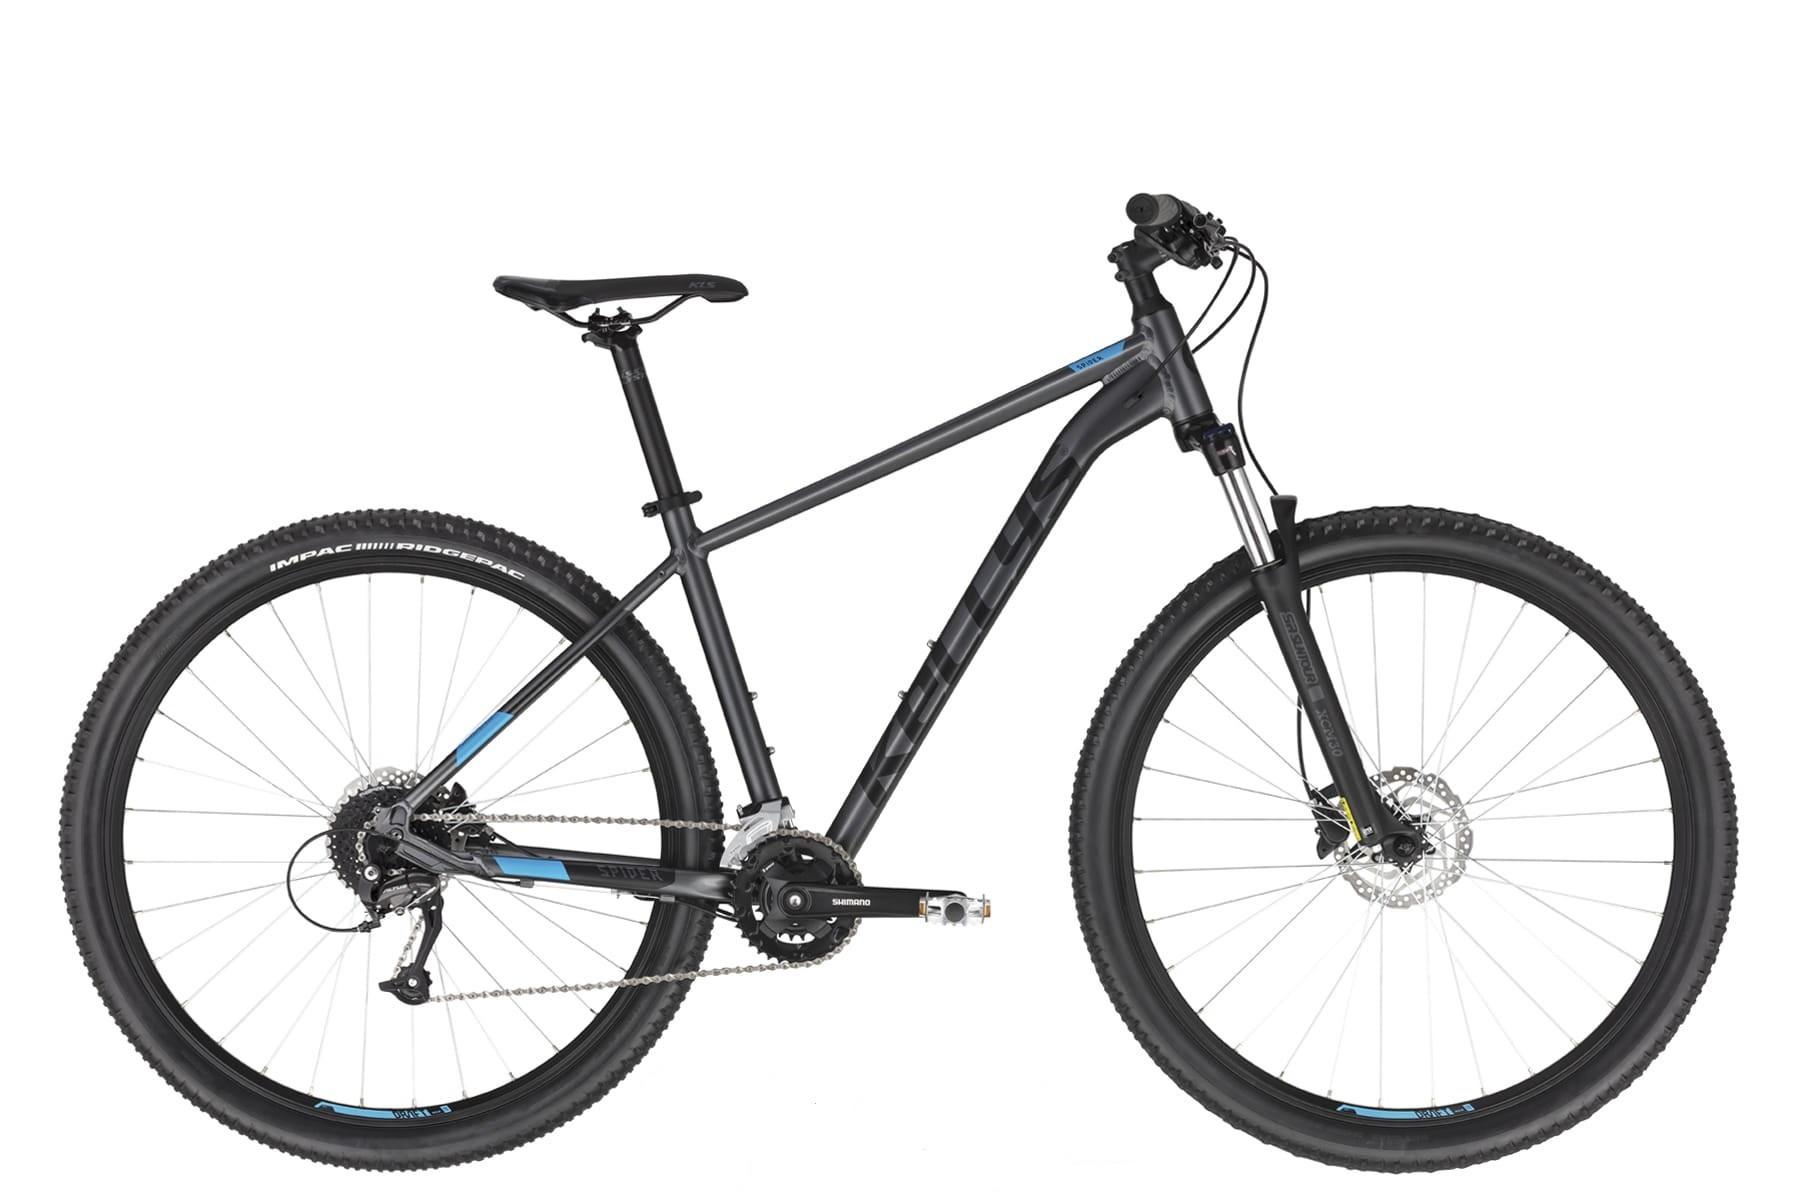 "Rower KELLYS Spider 70 Black M 29"" kolekcja 2021"